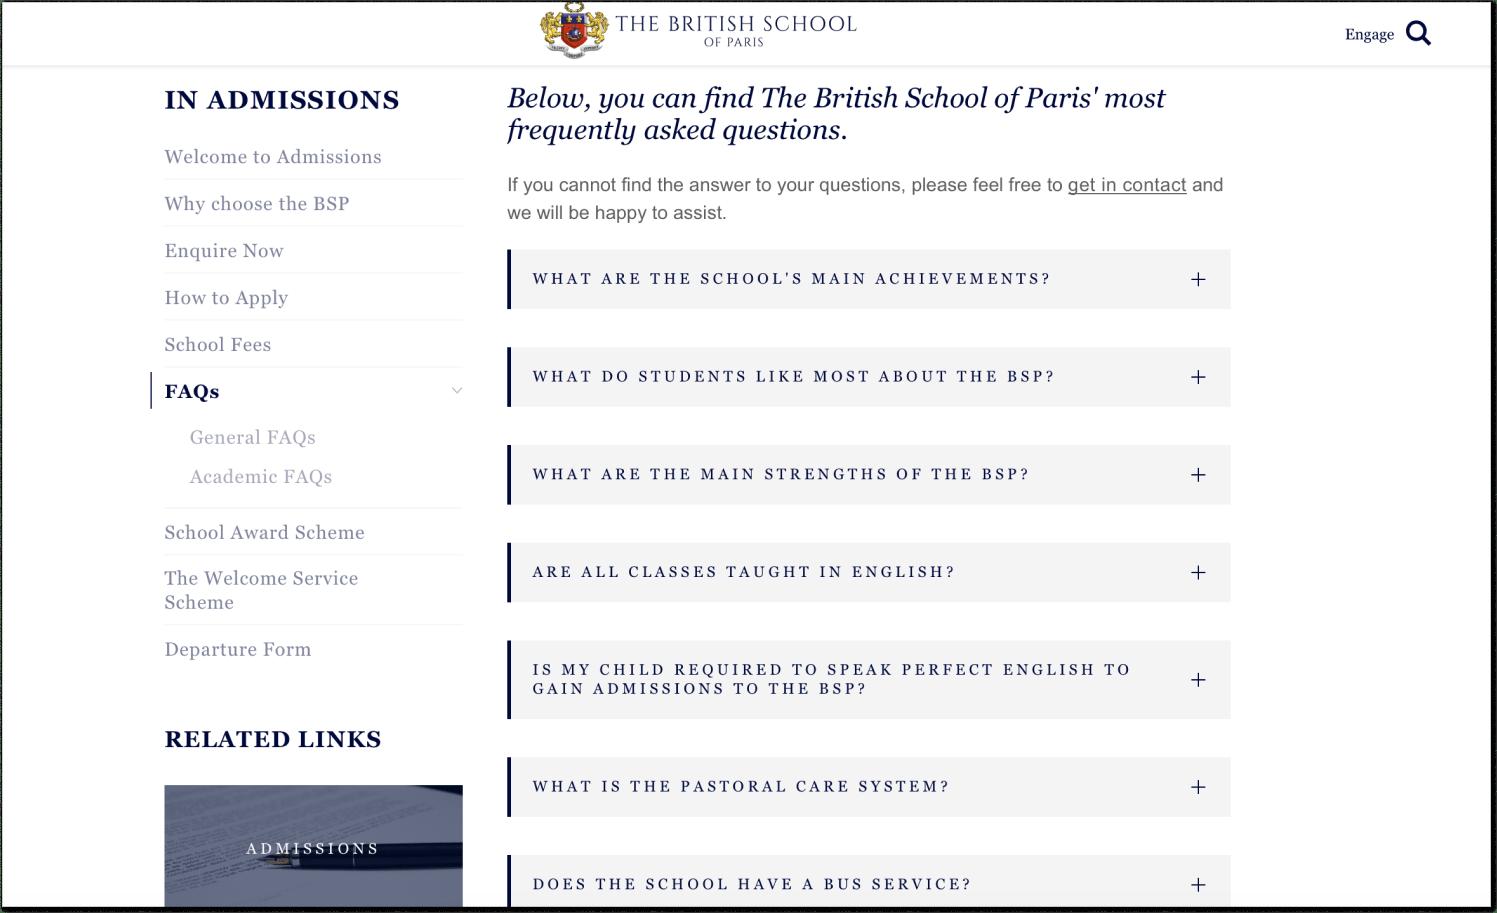 FAQ section at the British School of Paris website